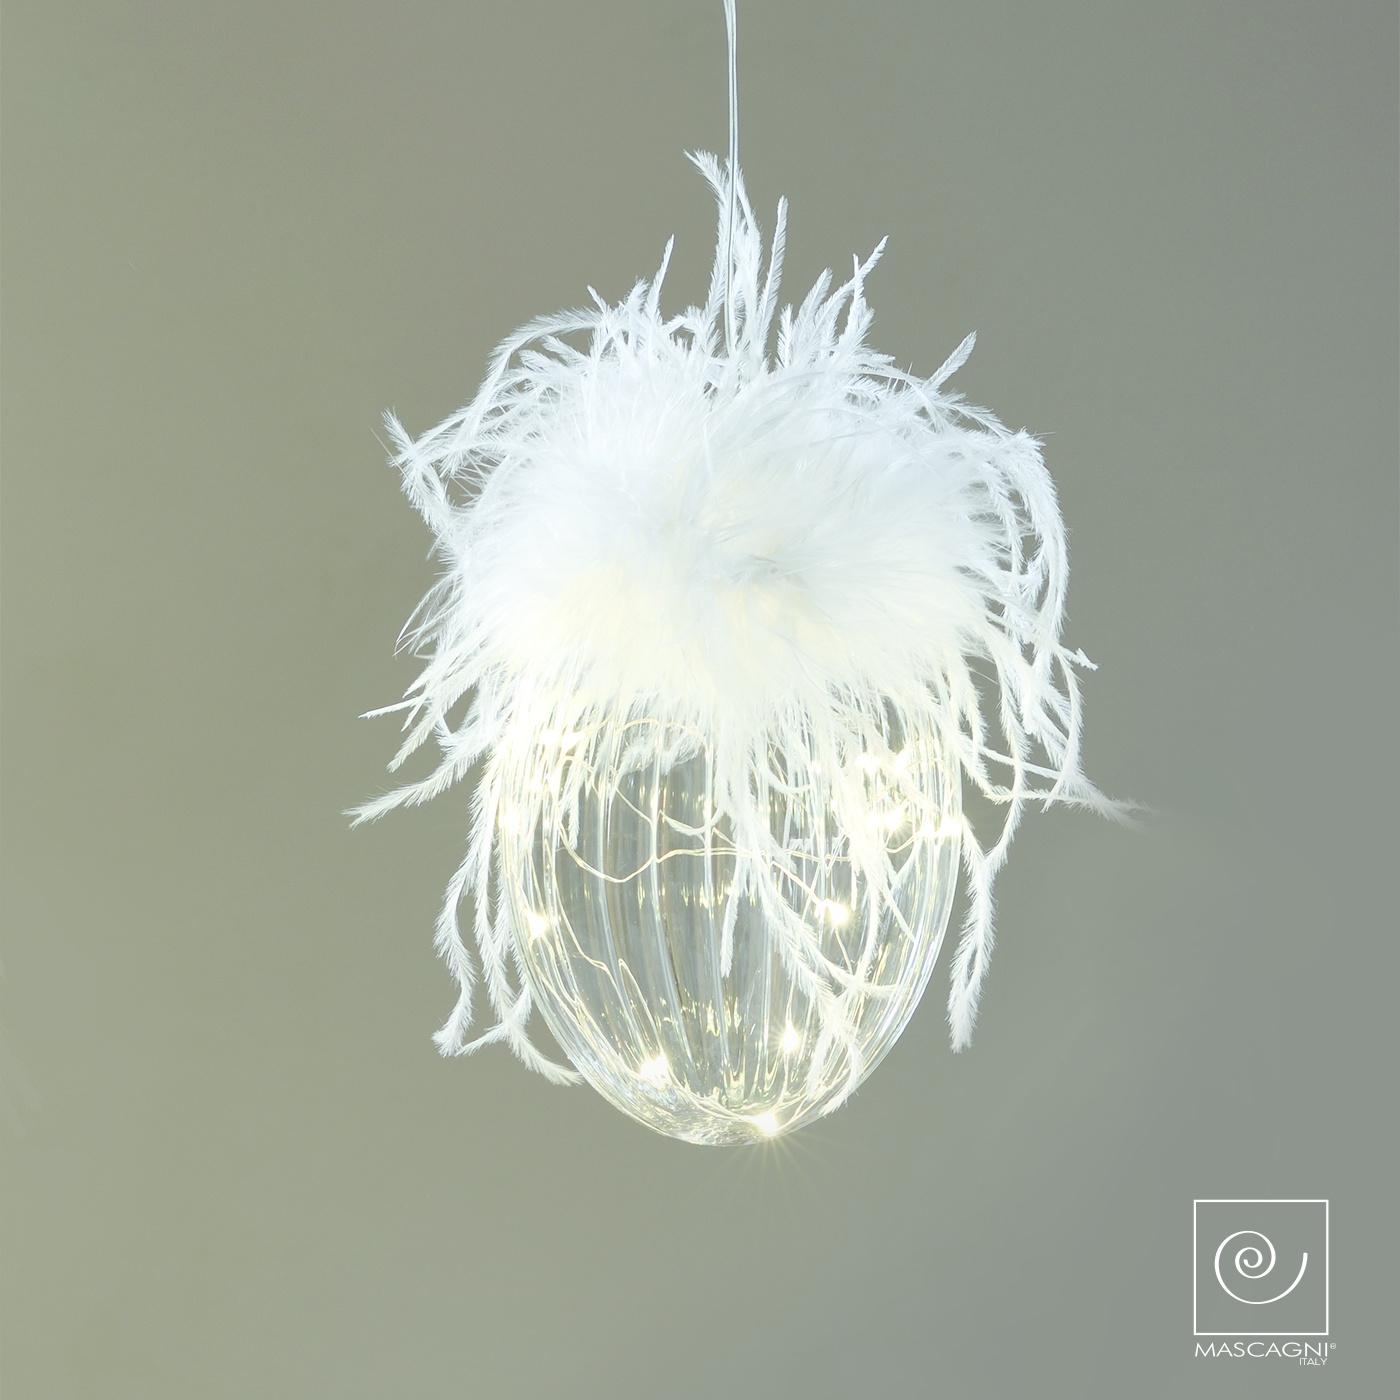 Art Mascagni BALL LED CM.16